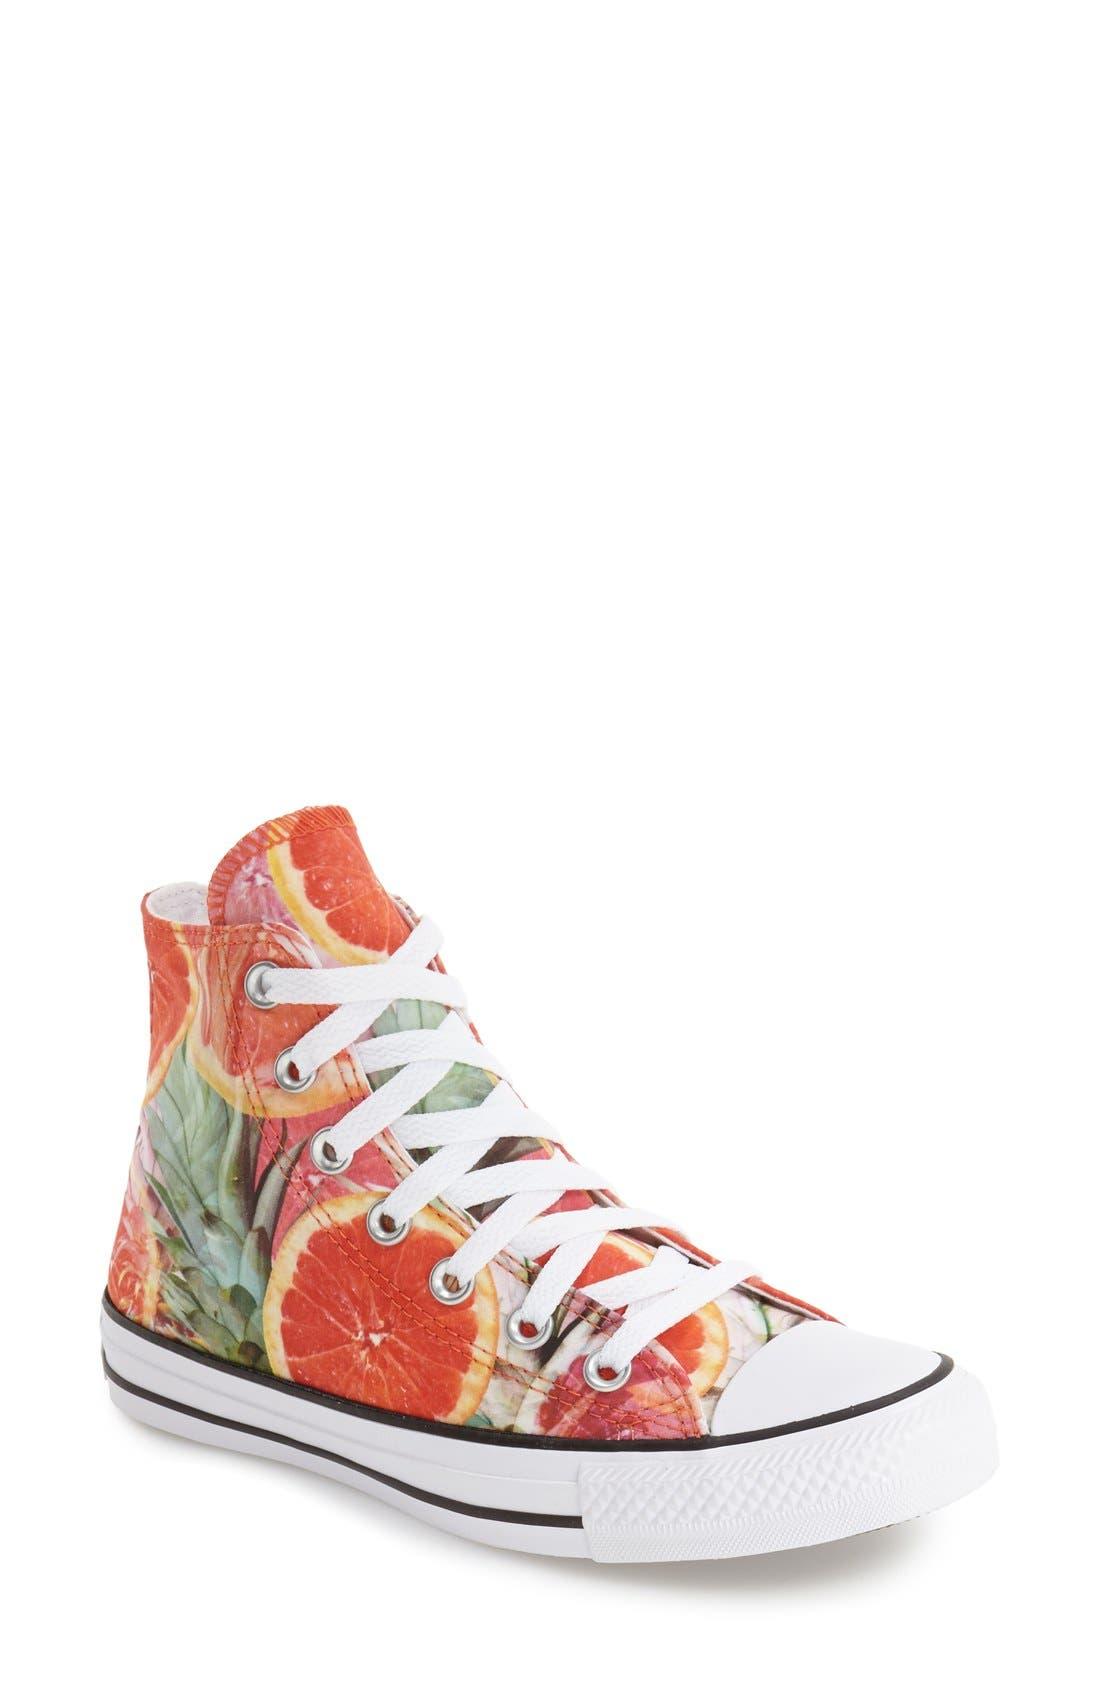 Alternate Image 1 Selected - Converse Chuck Taylor® All Star® Grapefruit Print High Top Sneaker (Women)